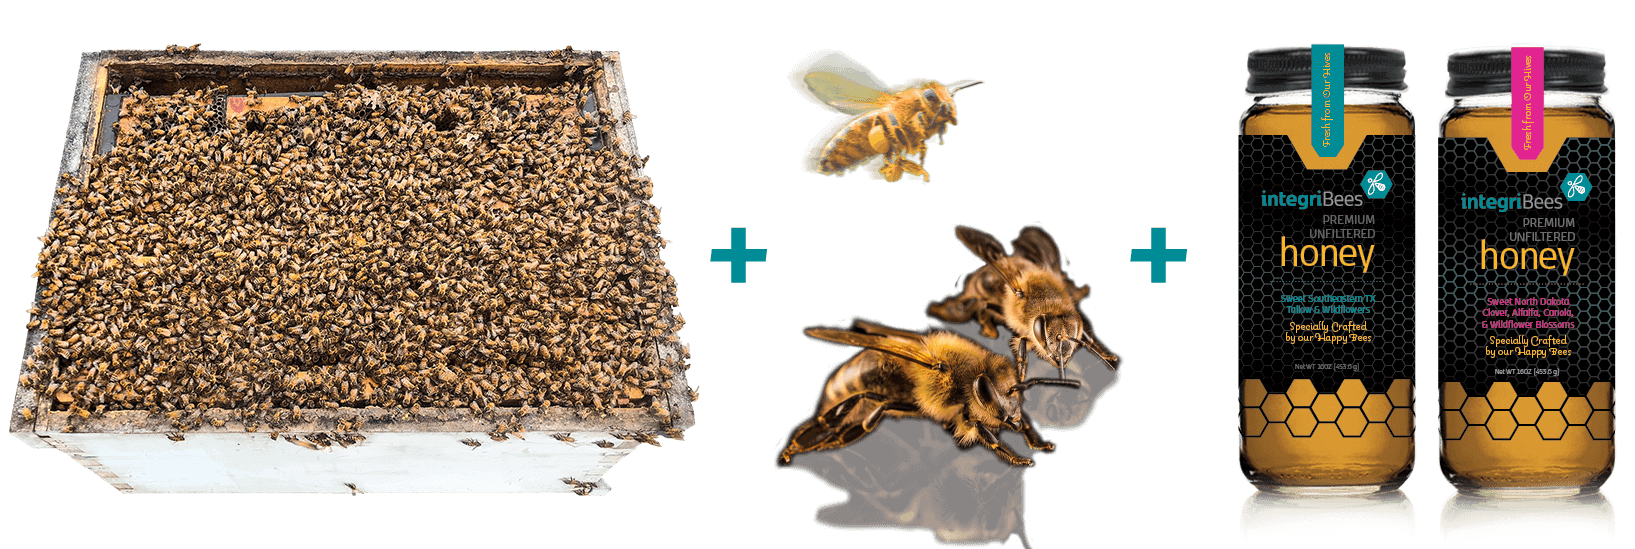 Bee Hive & Jars of Honey